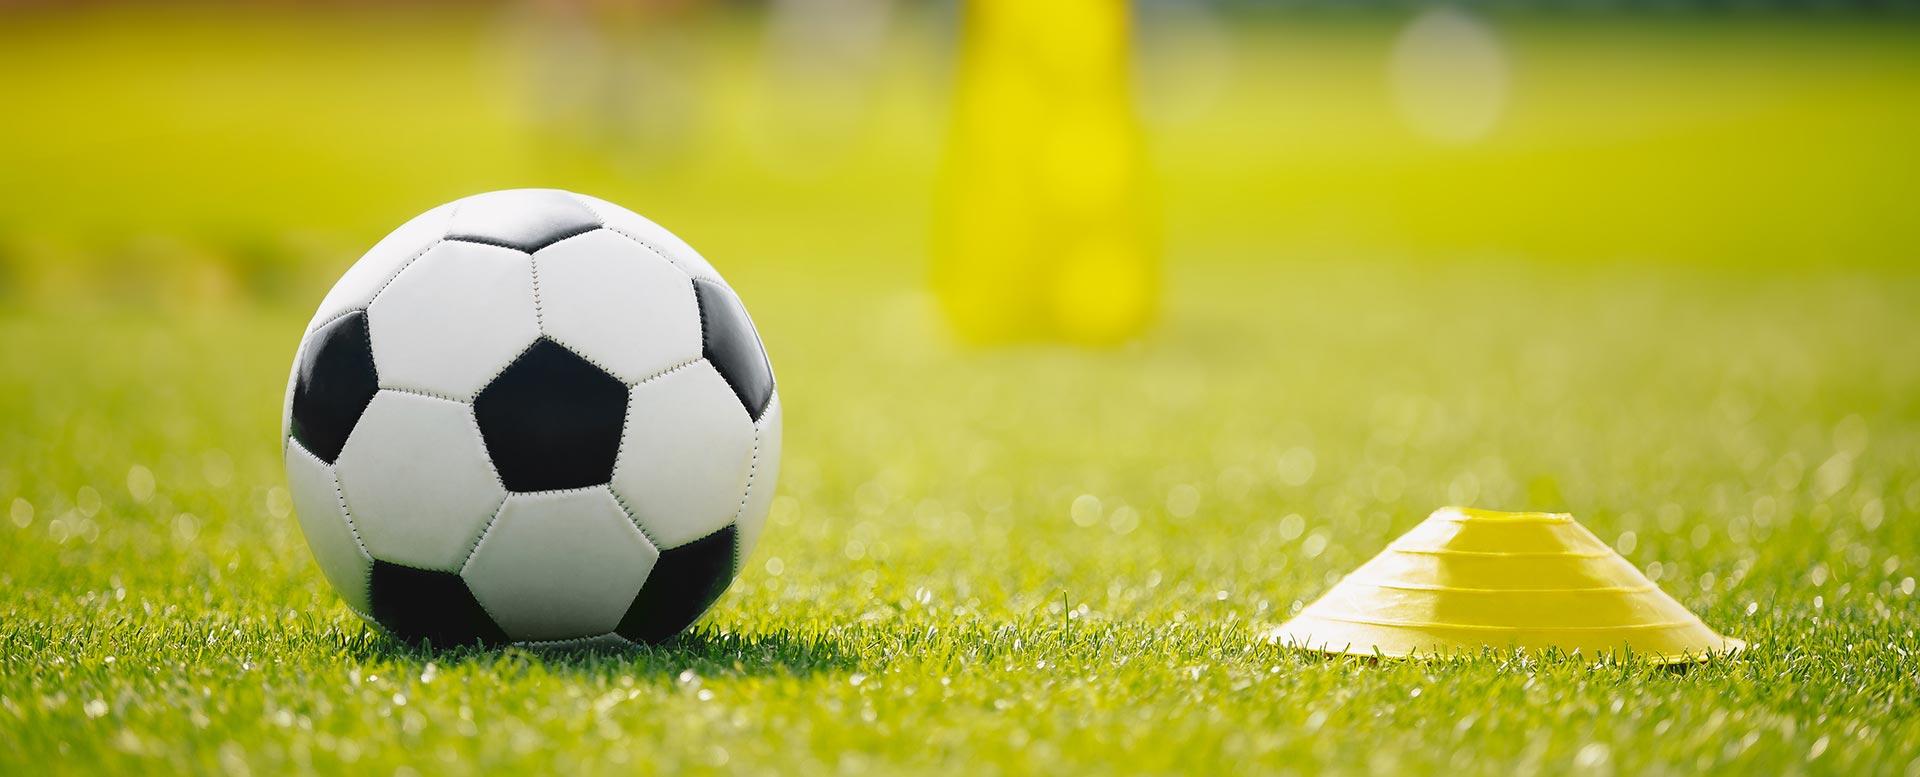 Fußball im Training